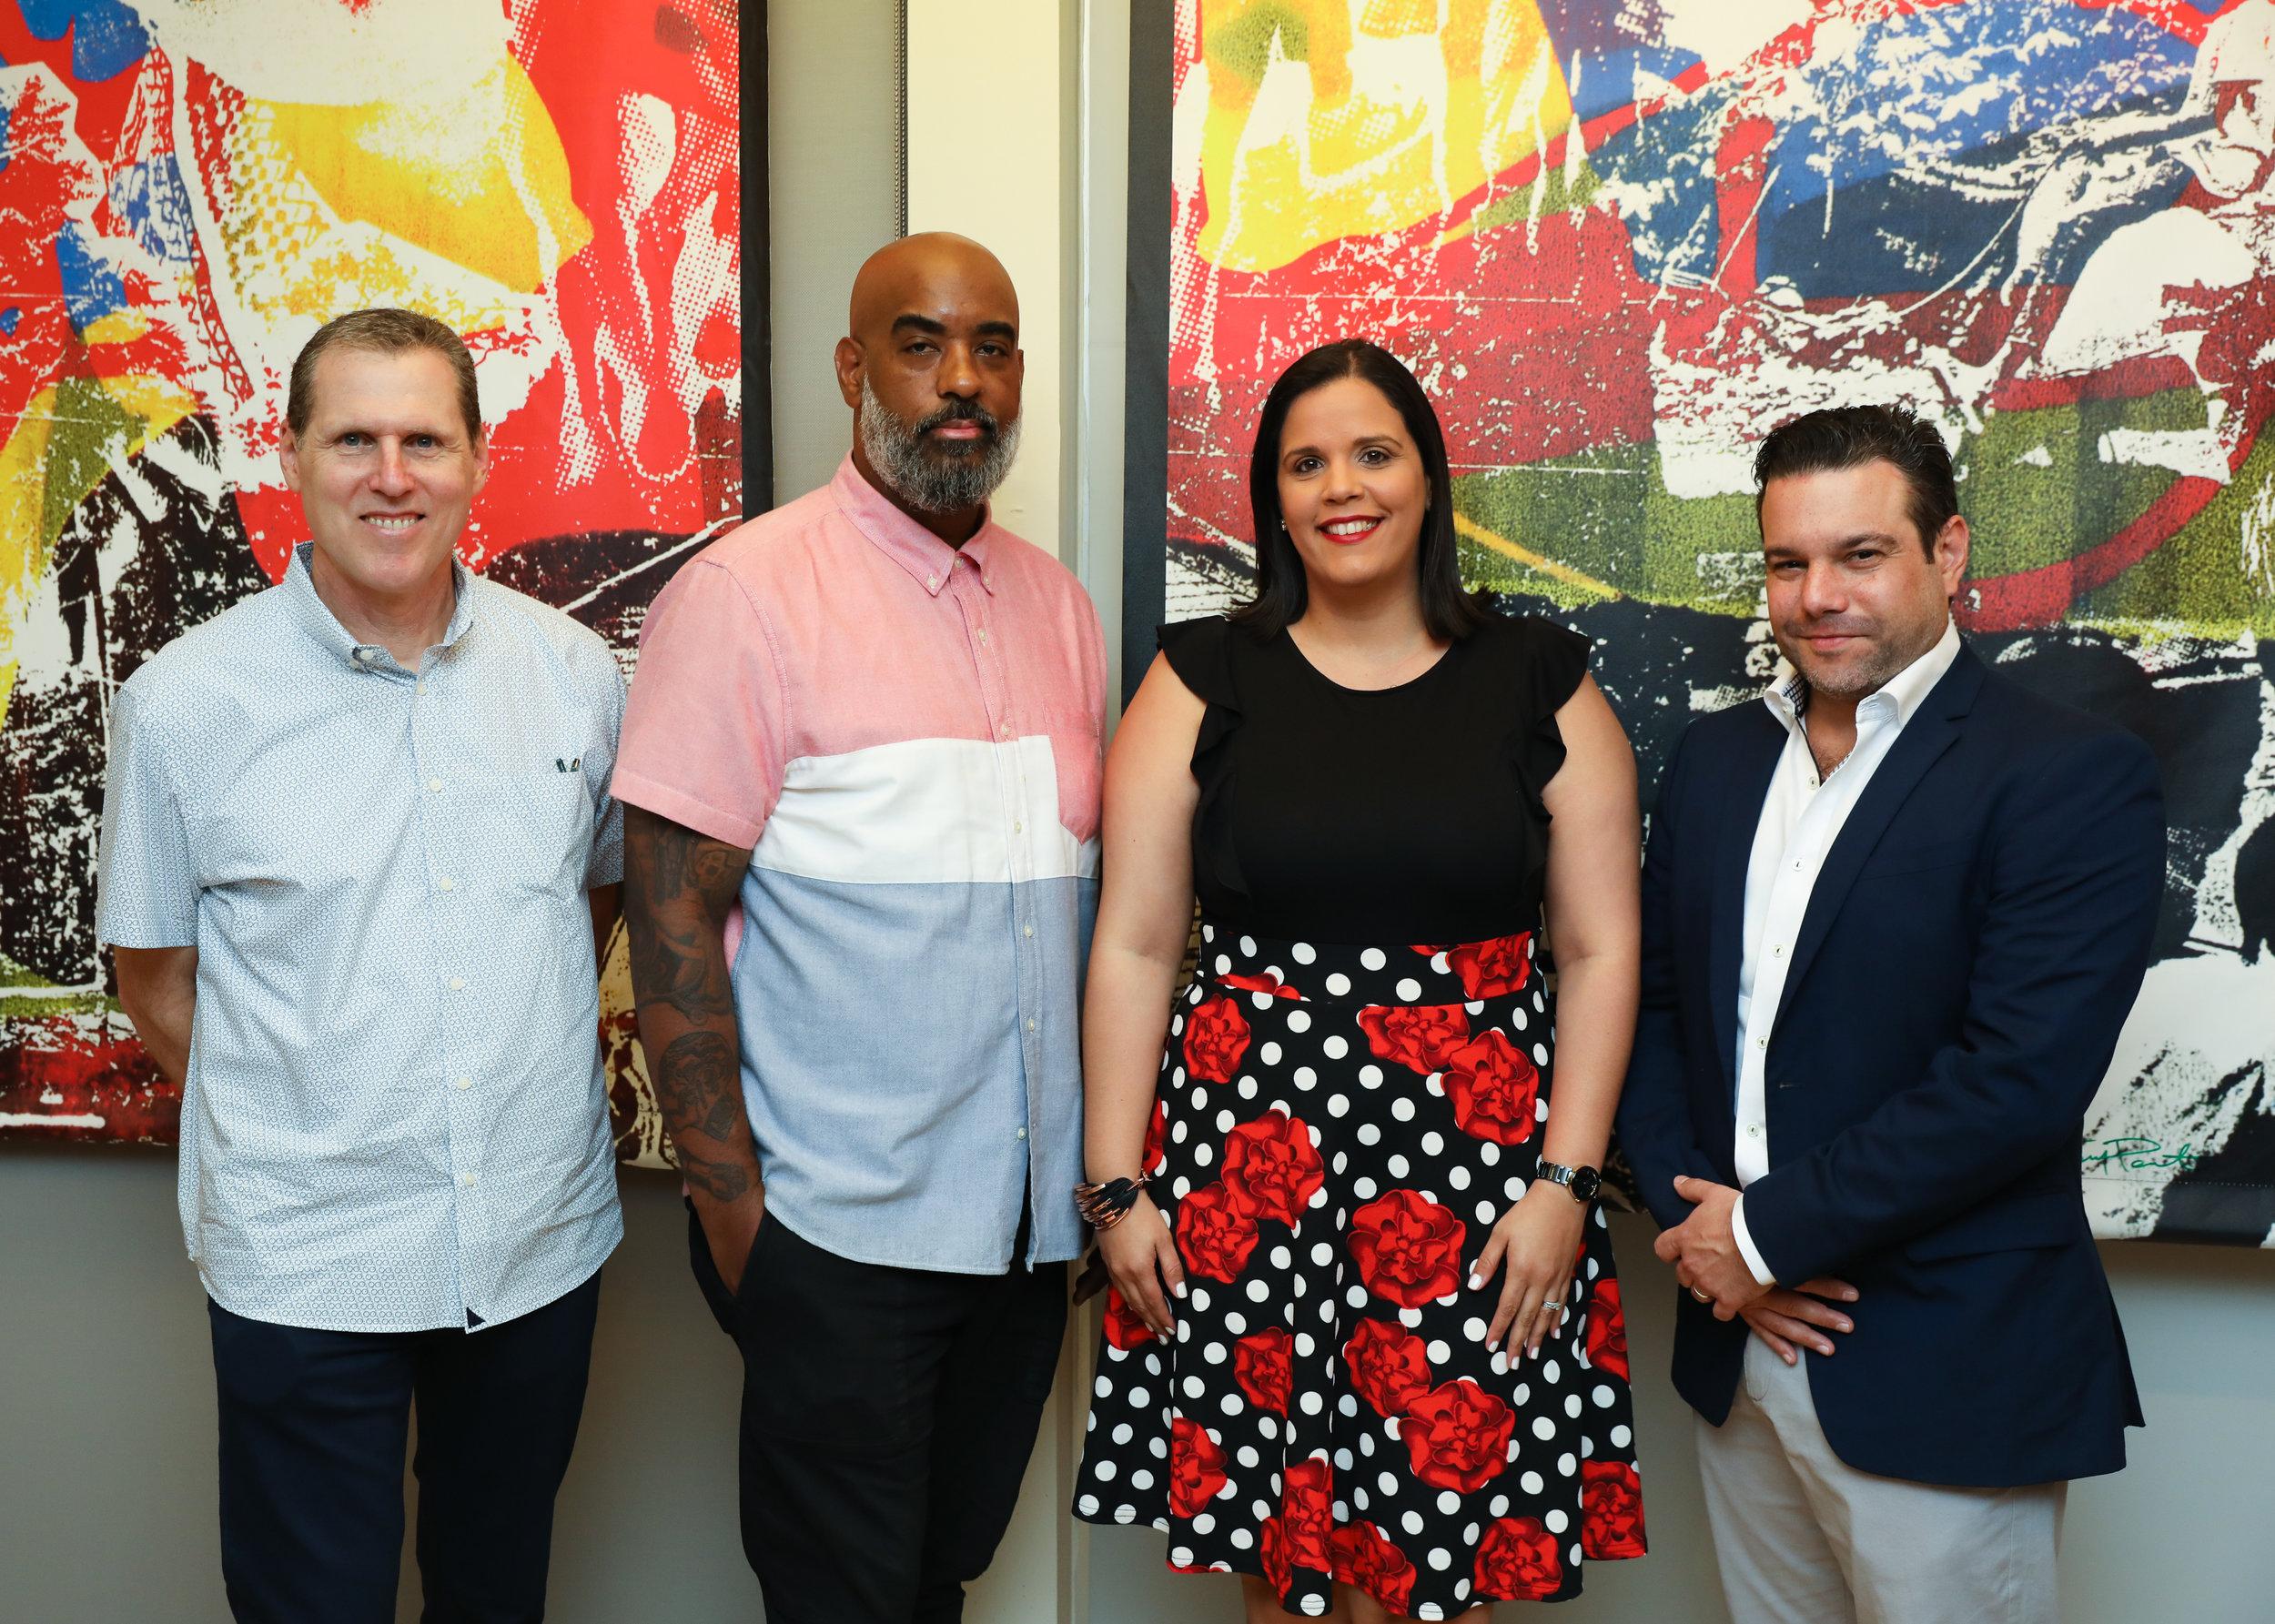 Rod Simmons, M. Tony Peralta, Rosa Peña and Miguel Diaz